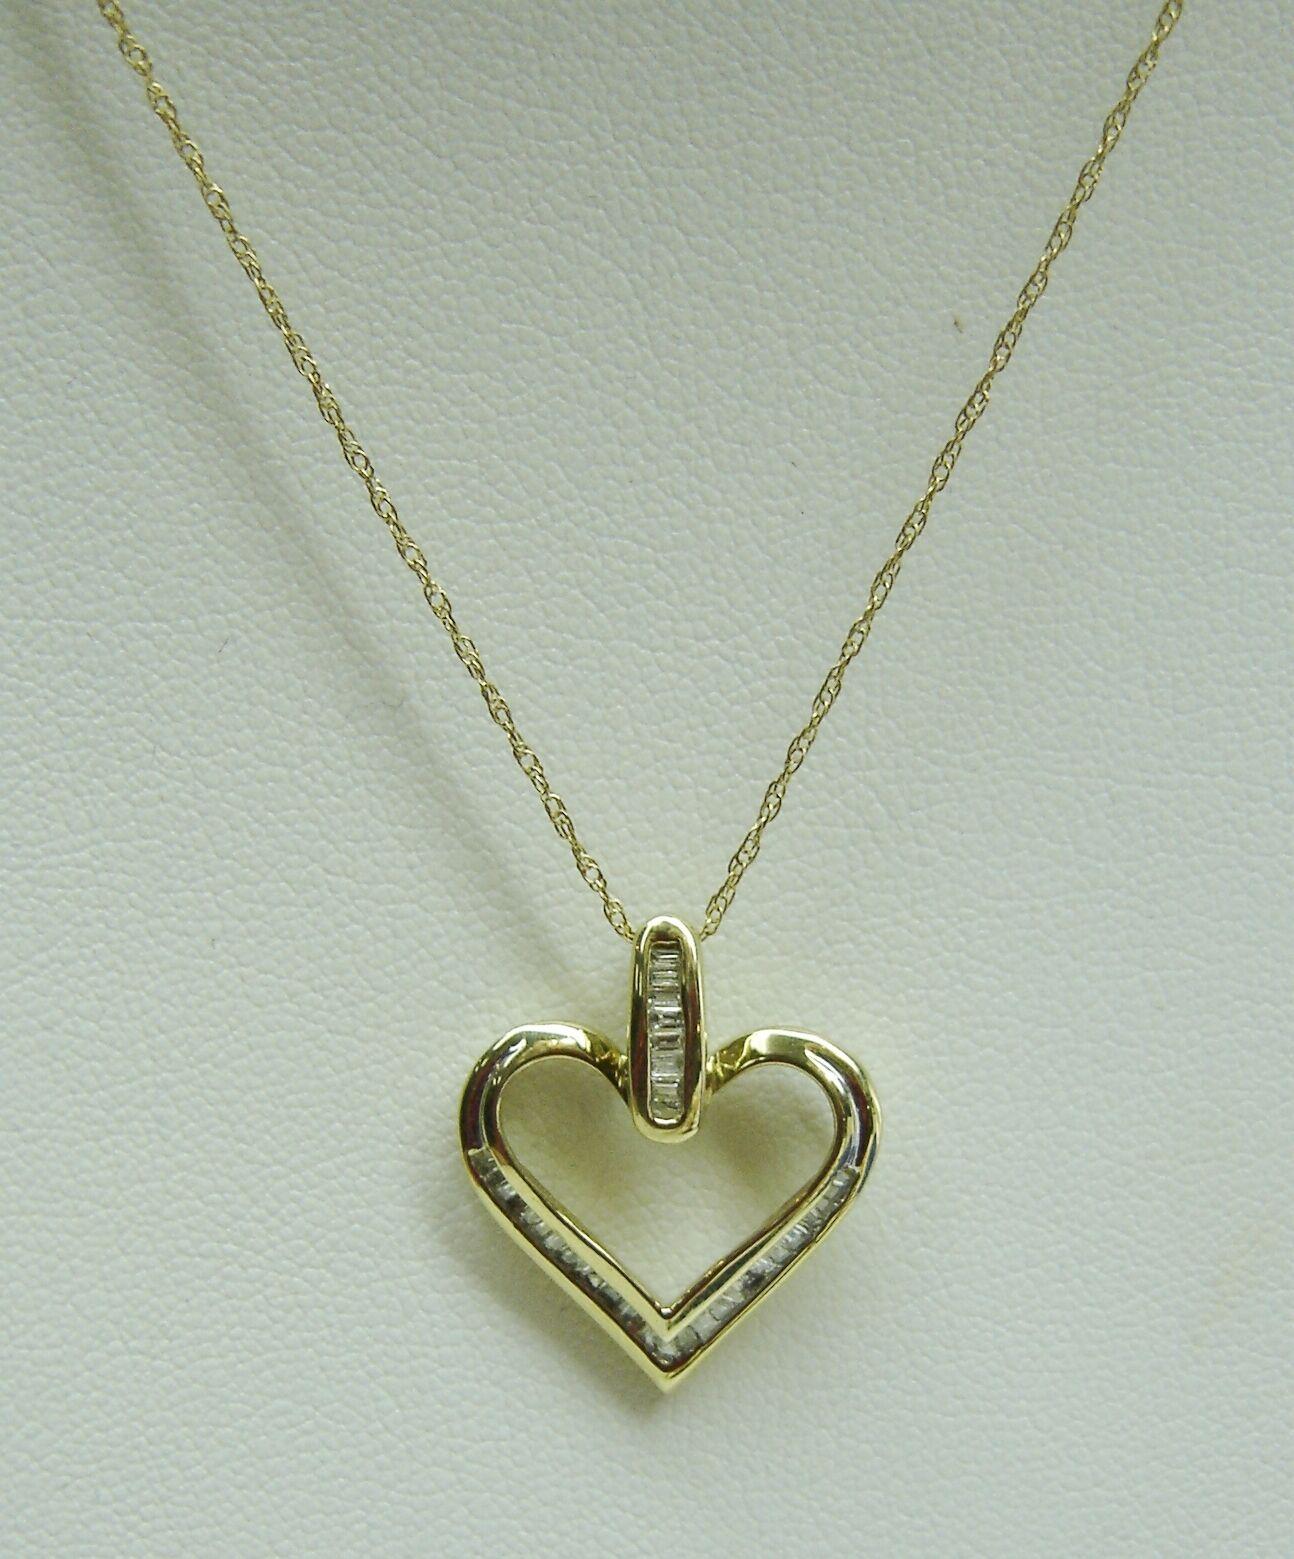 MY HEART FOREVER 10K Yellow gold 18 3 4  Chain W Baguette Diamond Pendant N273-Q